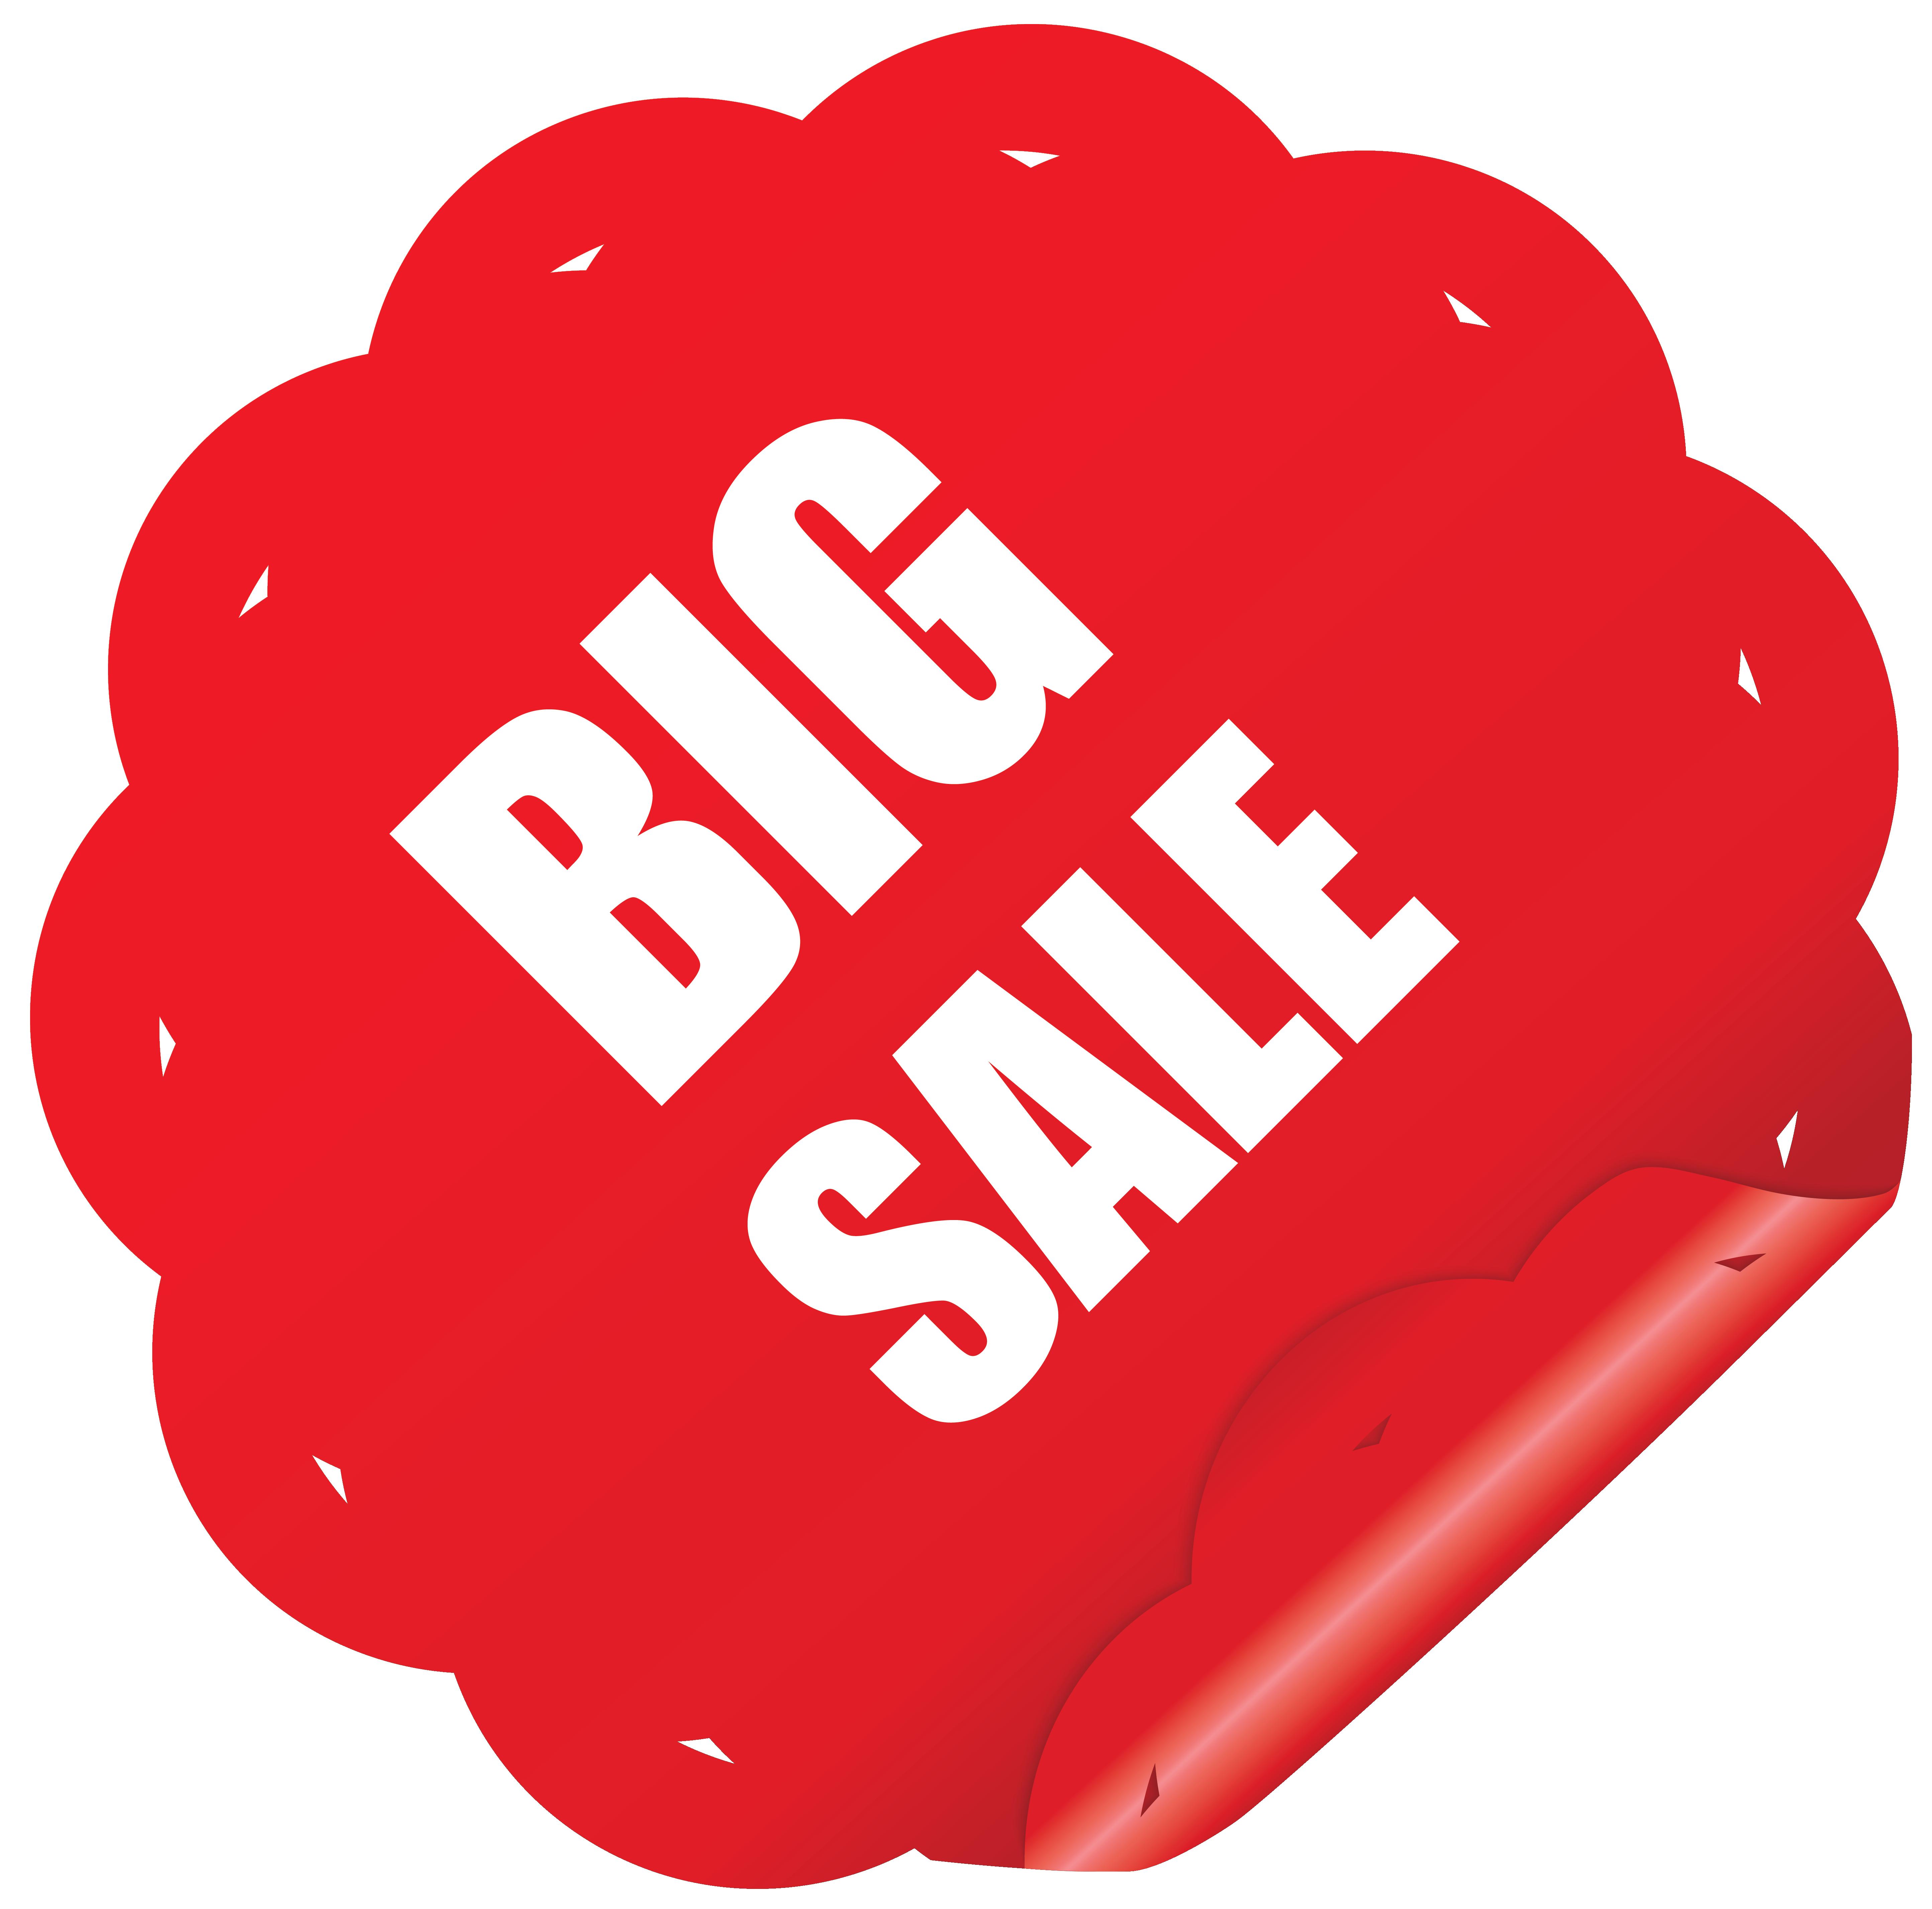 Heart donut clipart image black and white download Sales Sticker Label Clip art - Big Sale Sticker PNG Clipart Picture ... image black and white download